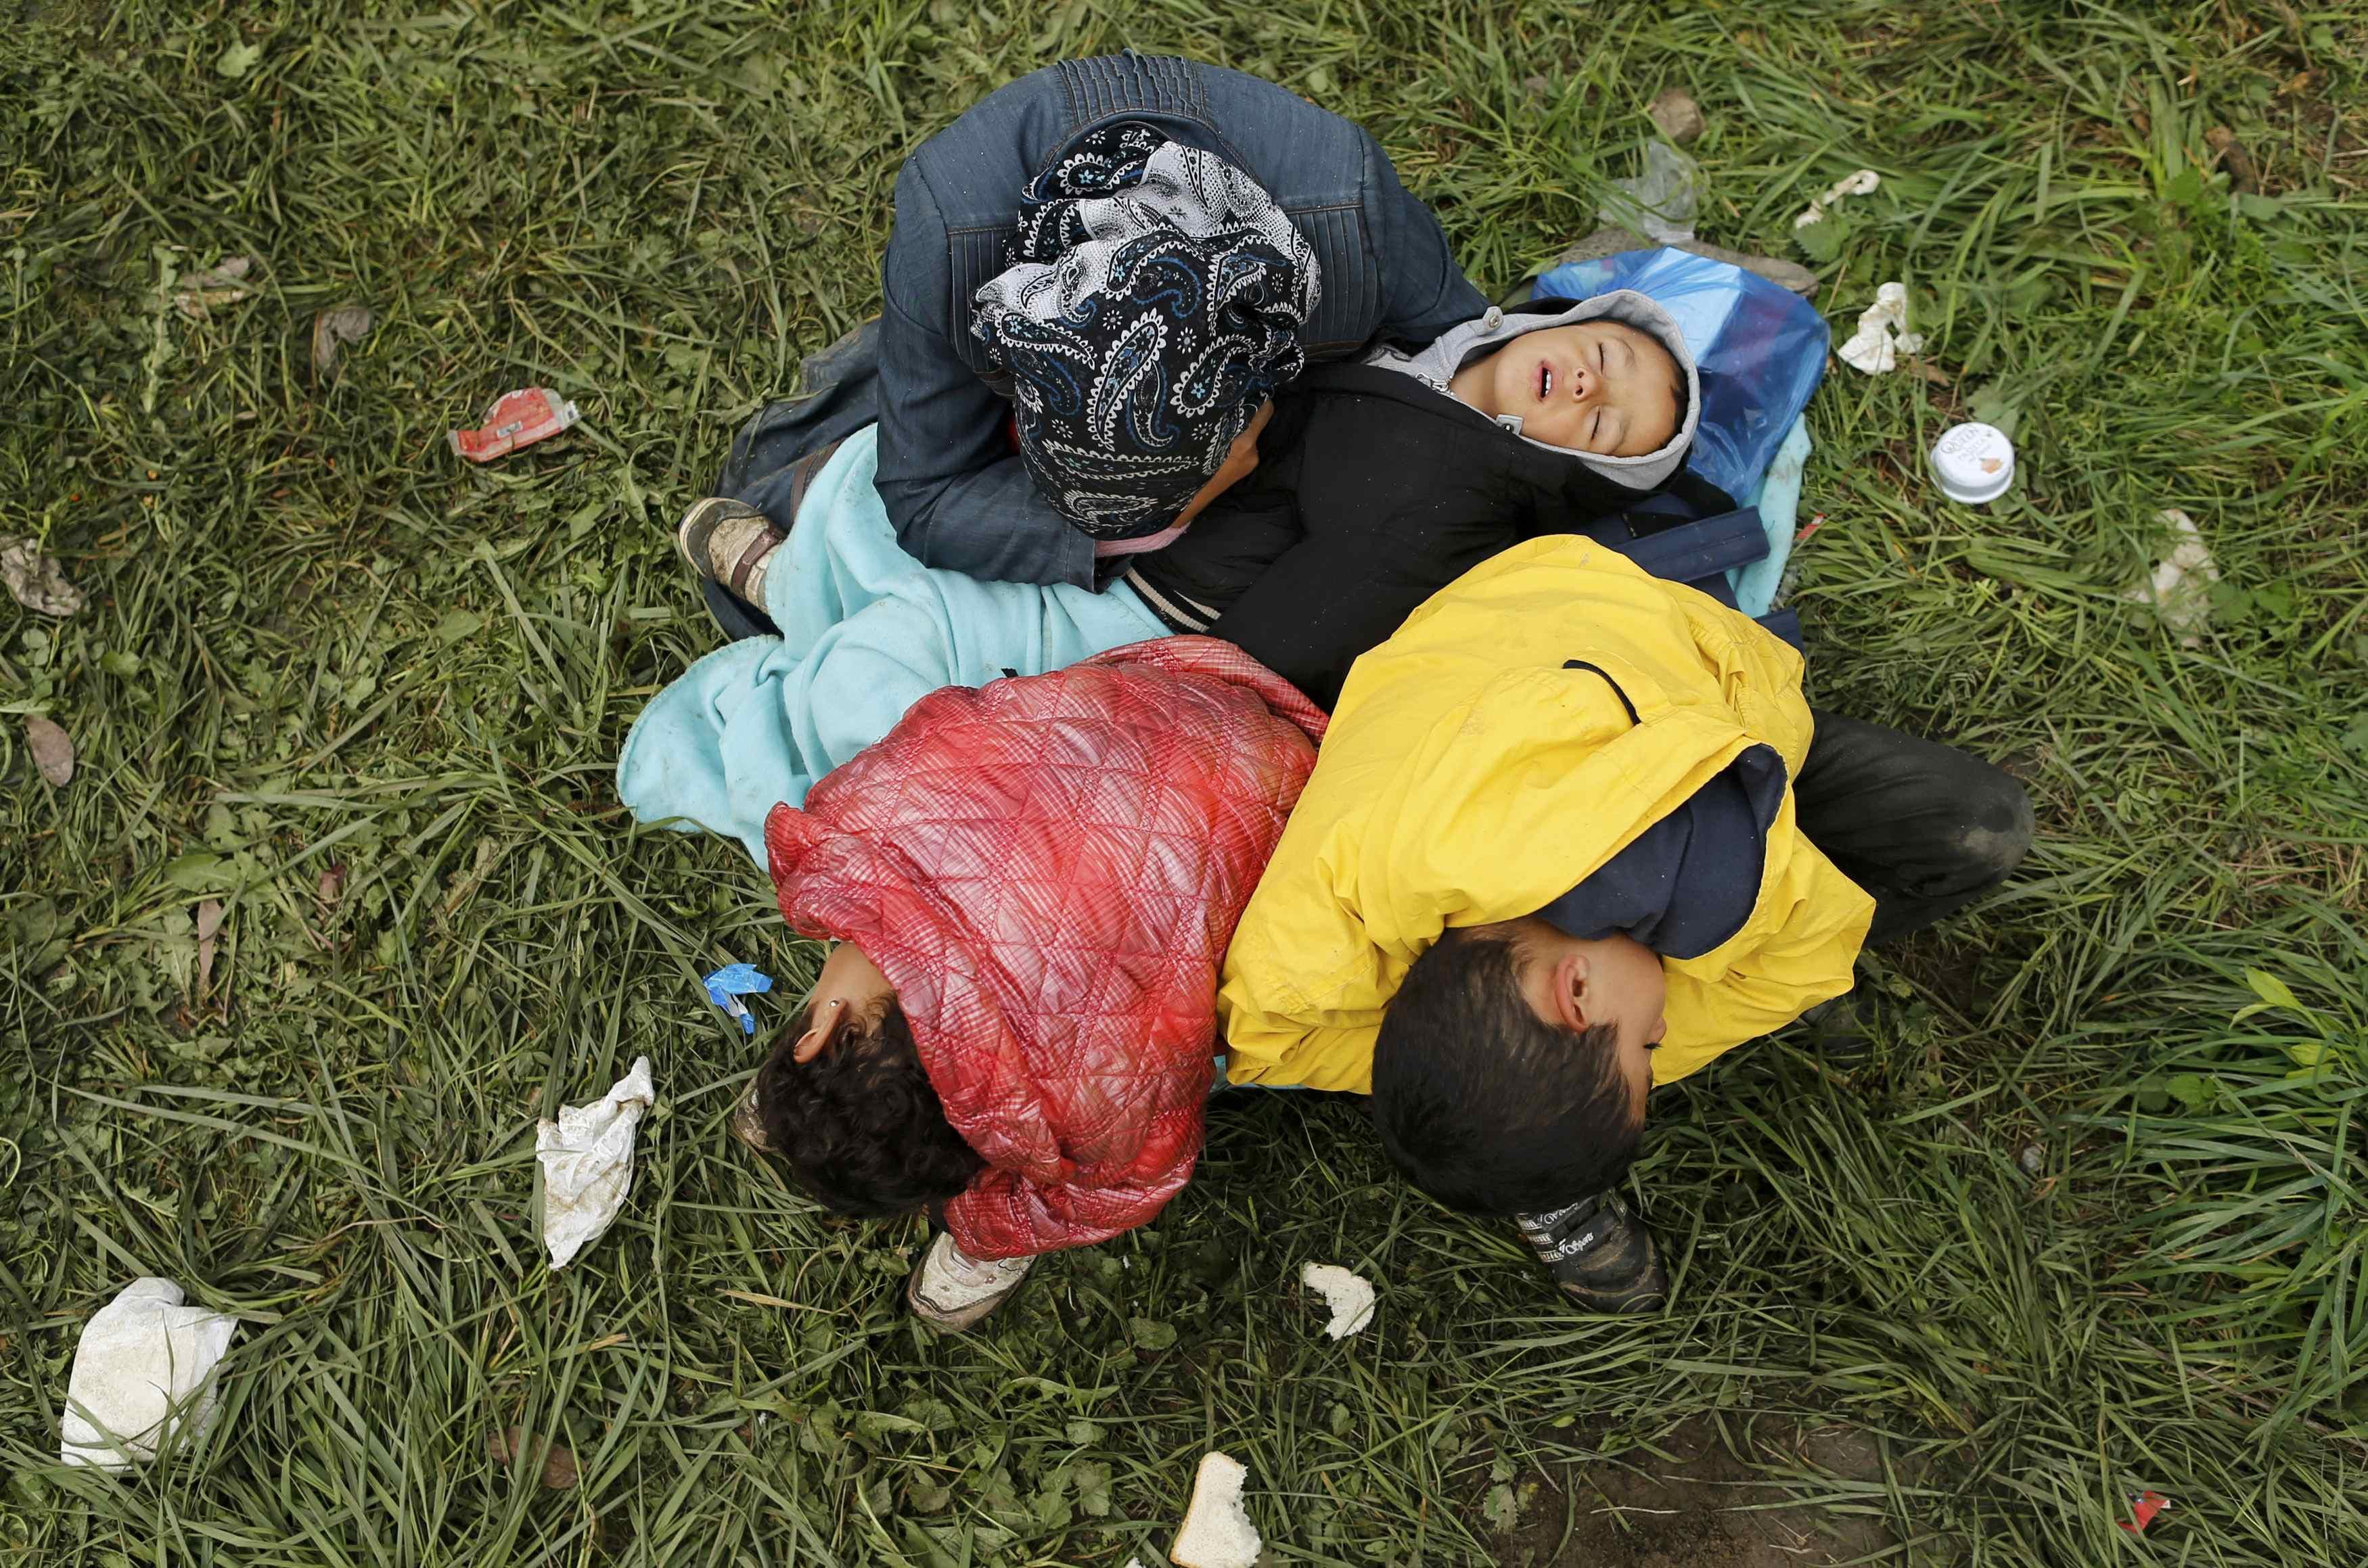 Seorang perempuan dan tiga orang anak berisitrahat  setelah migran menyeberangi perbatasan dari Kroasia dekat Rigonce, Slovenia, Rabu (21/10). Parlemen Slovenia meloloskan peraturan yang akan memberikan tentara kekuatan lebih untuk menolong polisi menjaga perbatasan negara saat ribuan migran memasuki negeri tersebut dari Kroasia setelah Hungaria menutup perbatasannya. ANTARA FOTO/REUTERS/Antonio Bronic.